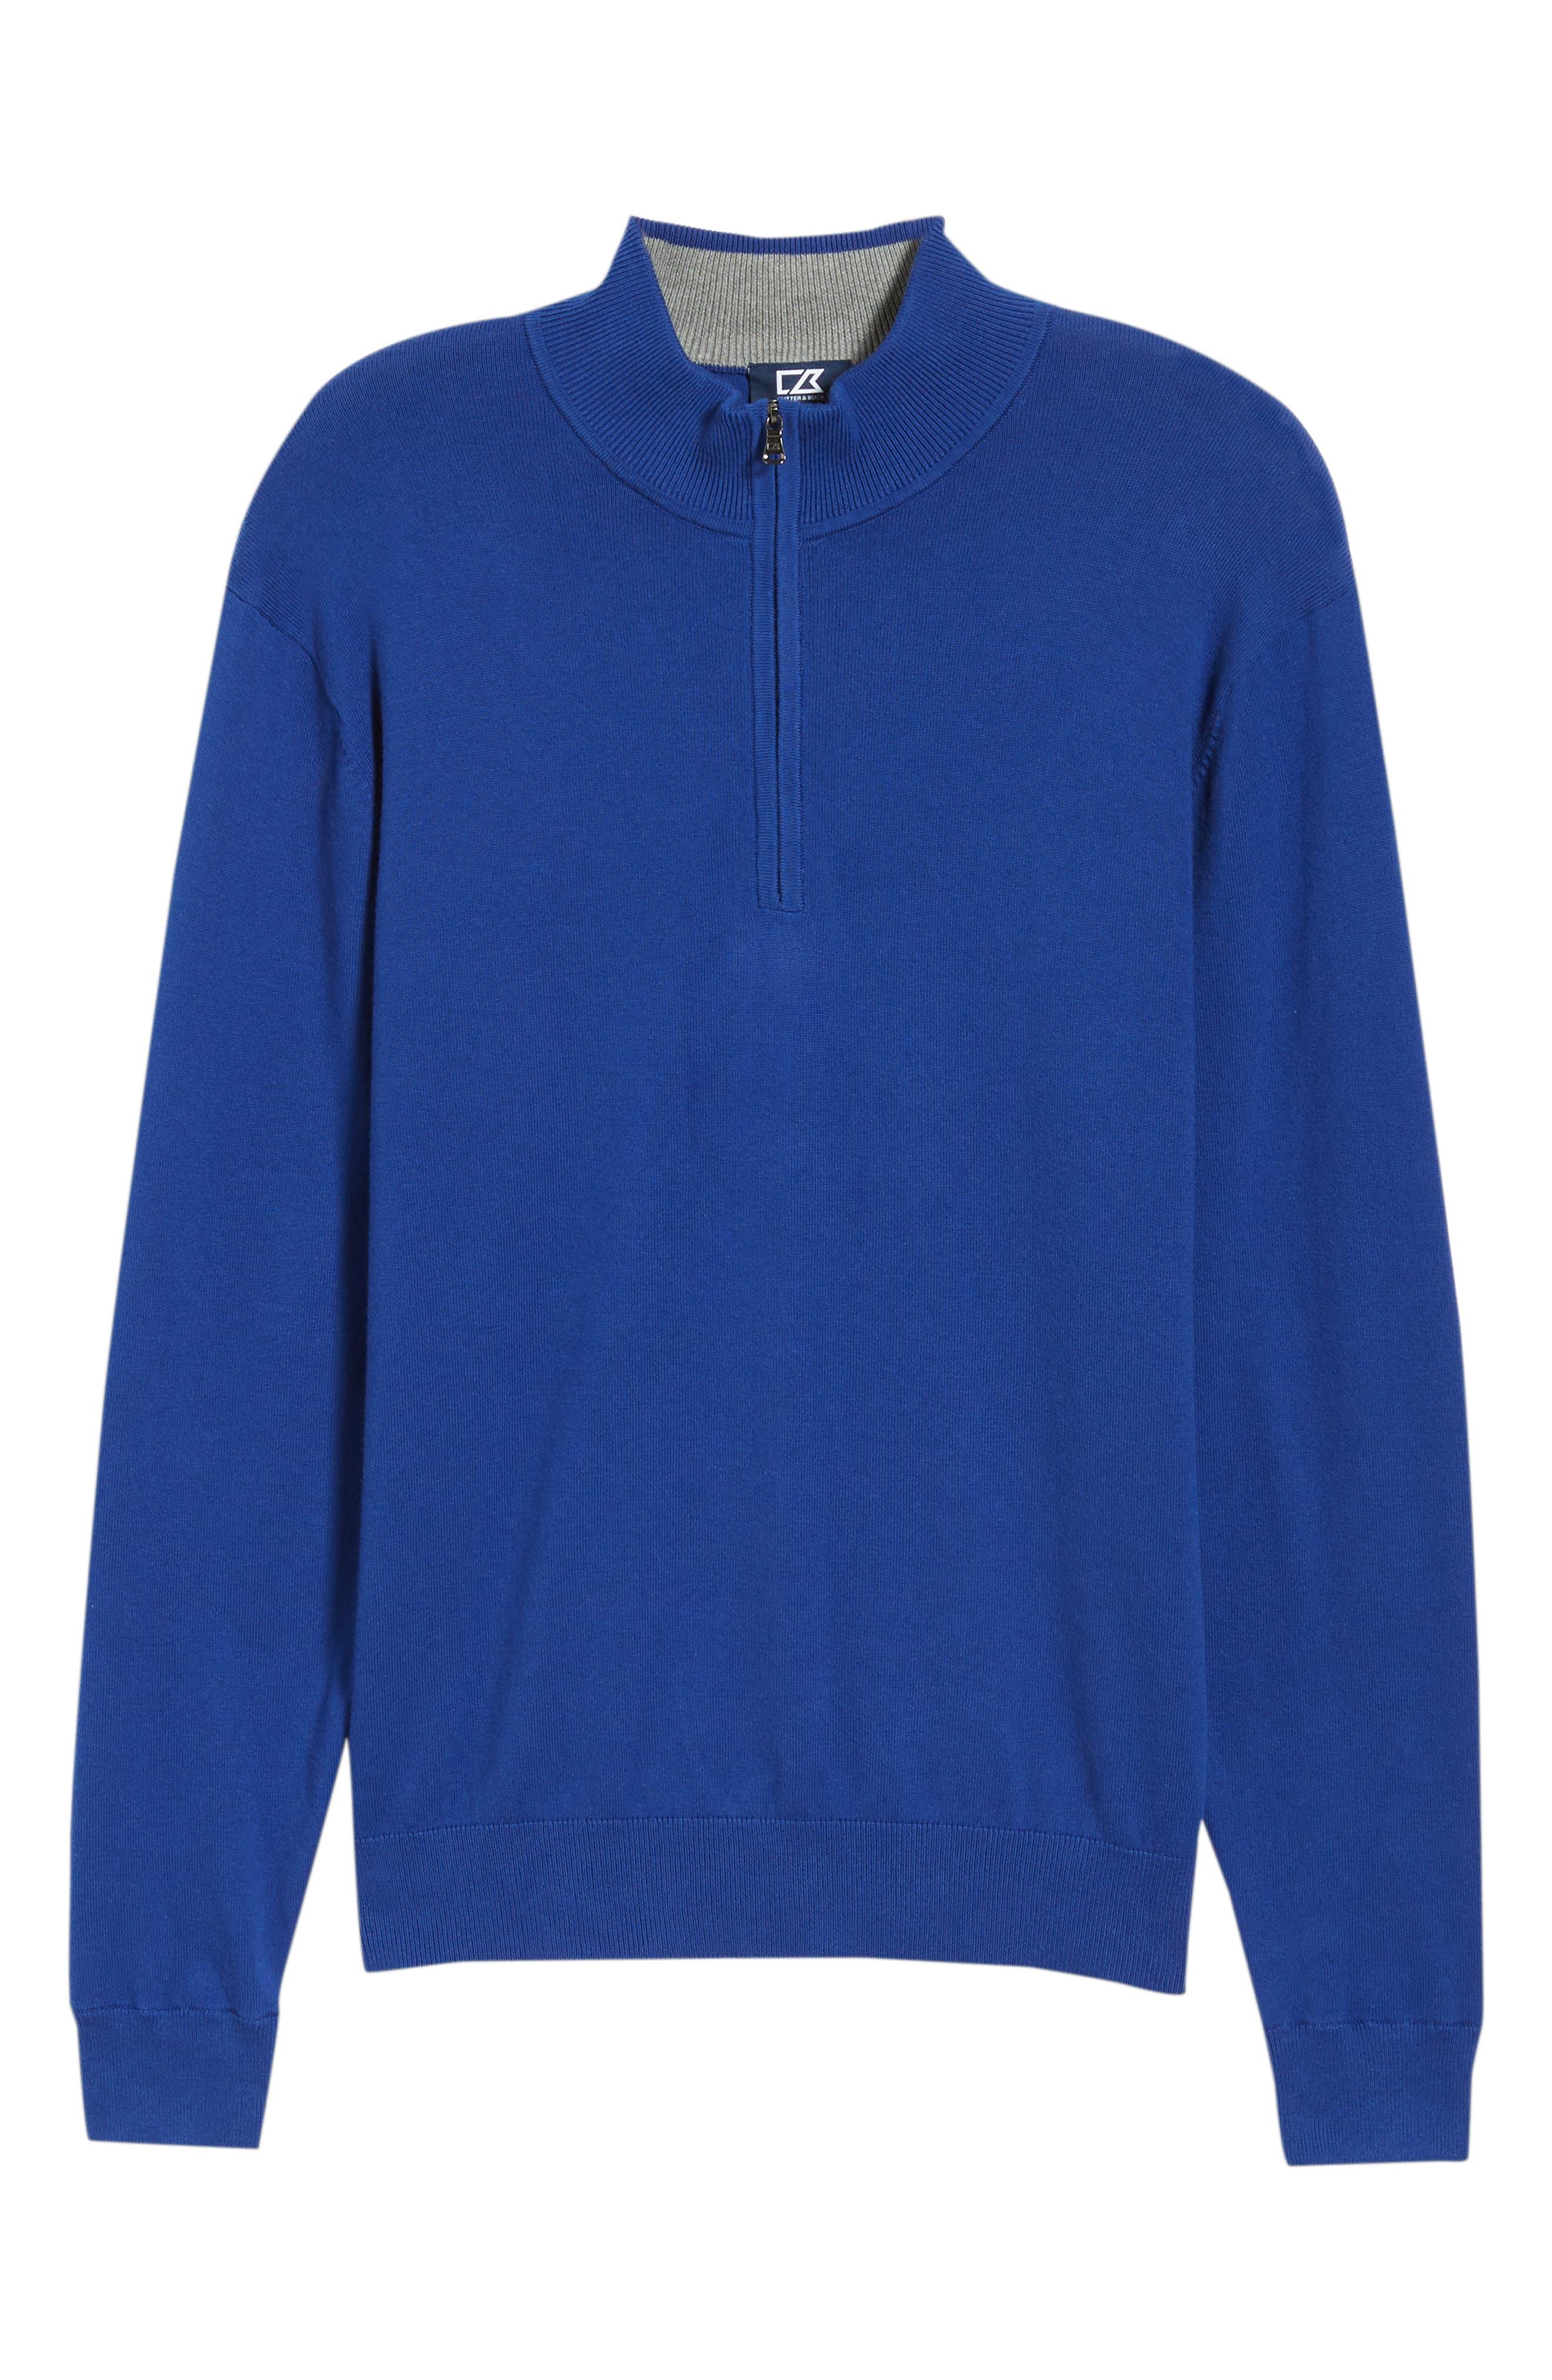 Lakemont Half Zip Sweater,                             Alternate thumbnail 6, color,                             BOLT